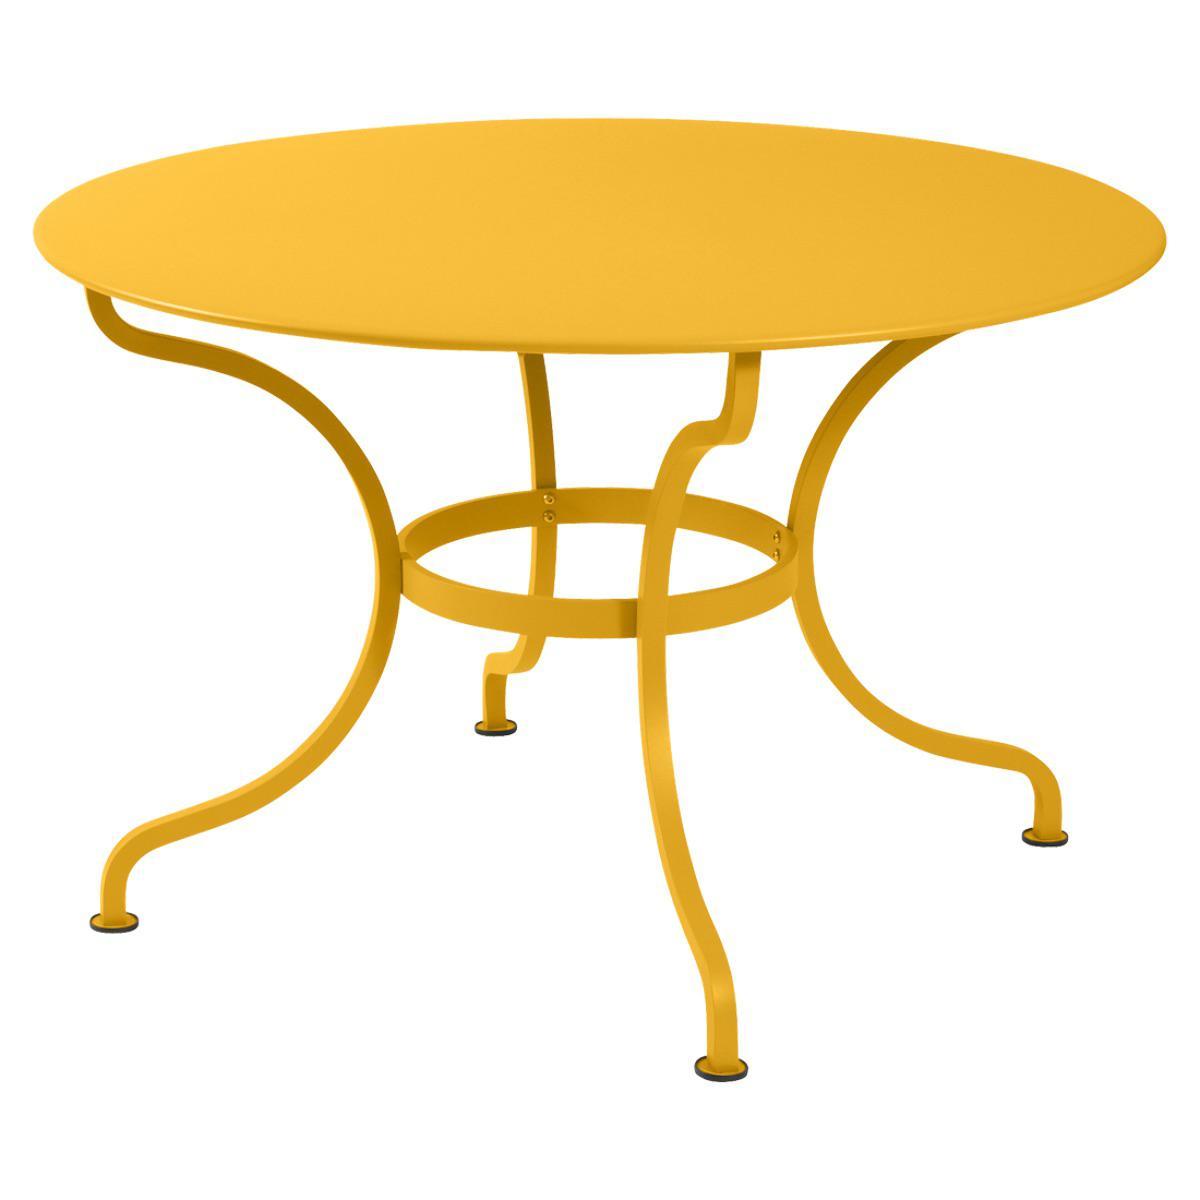 Table ronde 117cm ROMANE Fermob miel